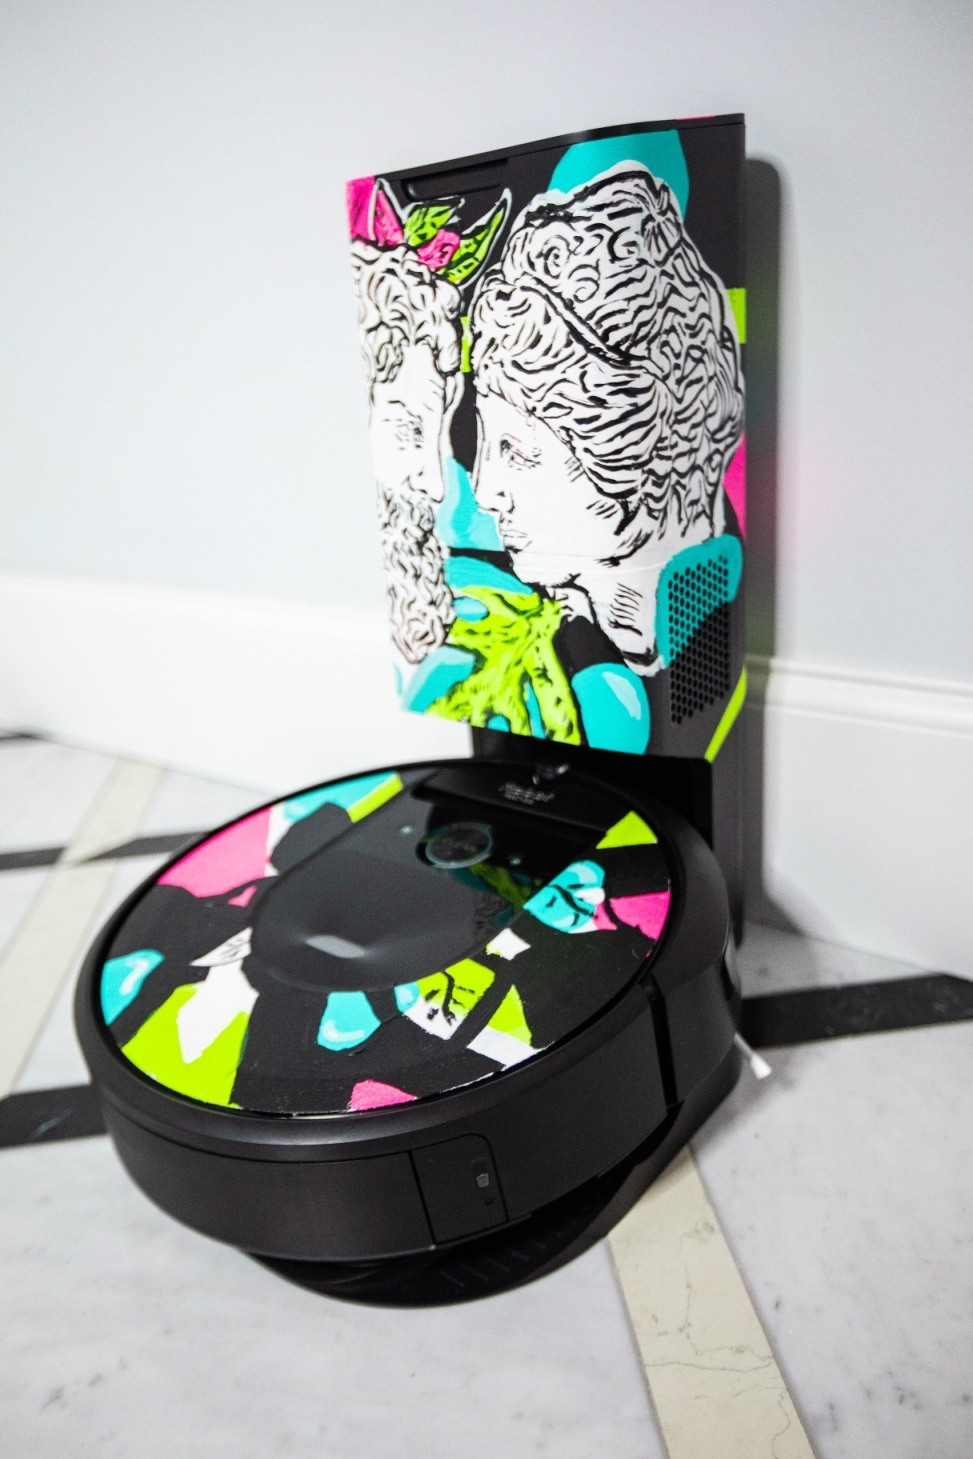 Mateusz Suda iRobota Roomba i7+